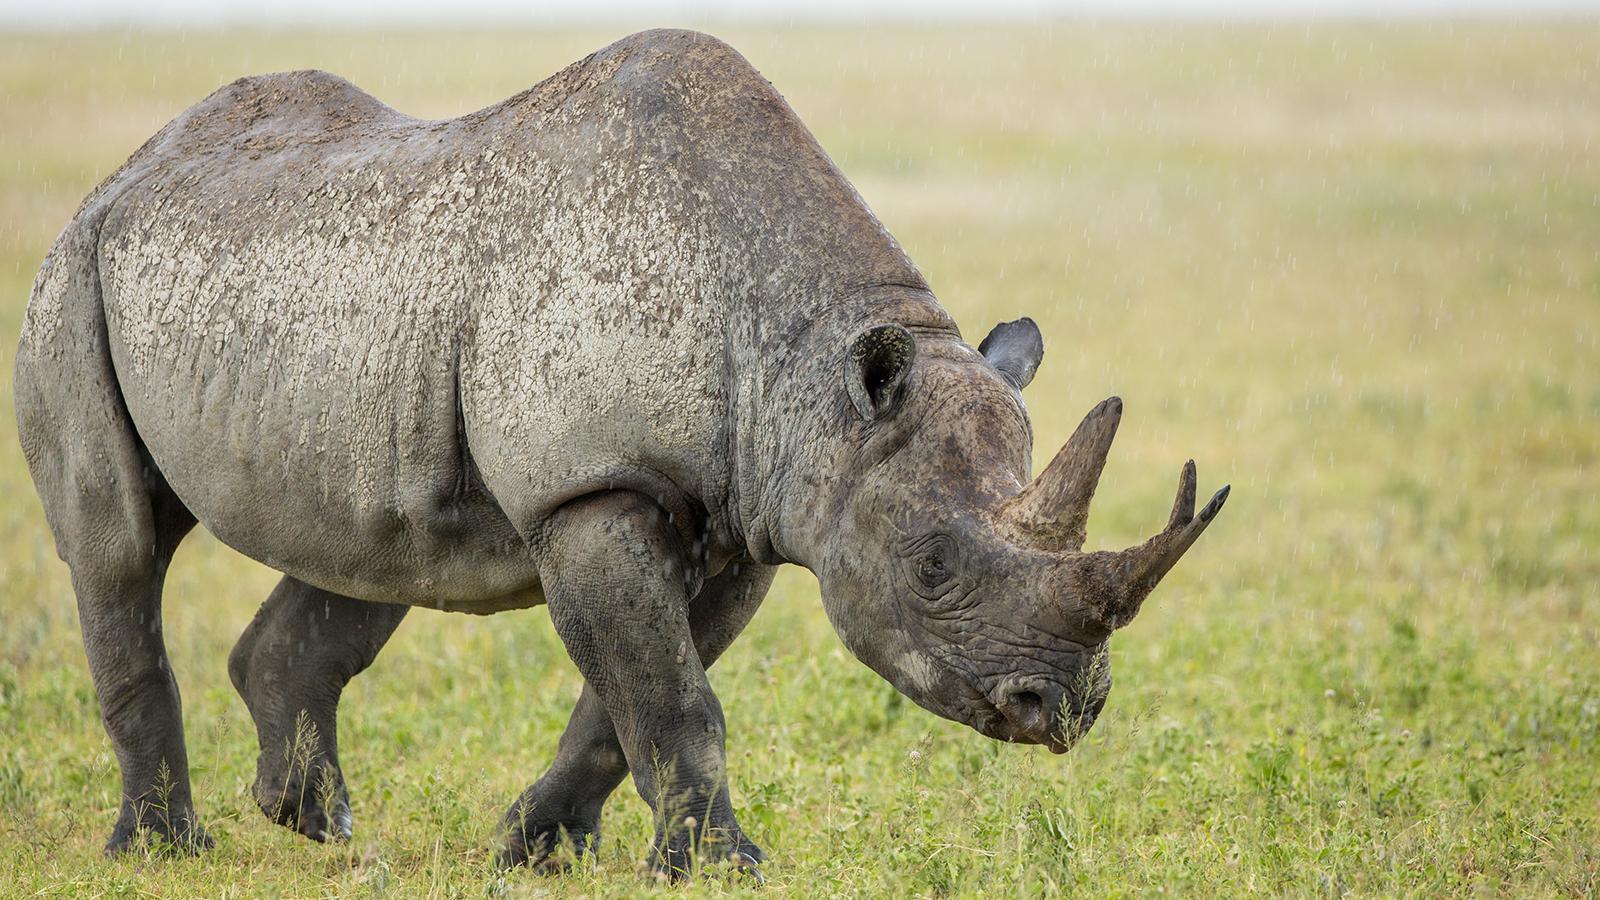 Rhino's farts